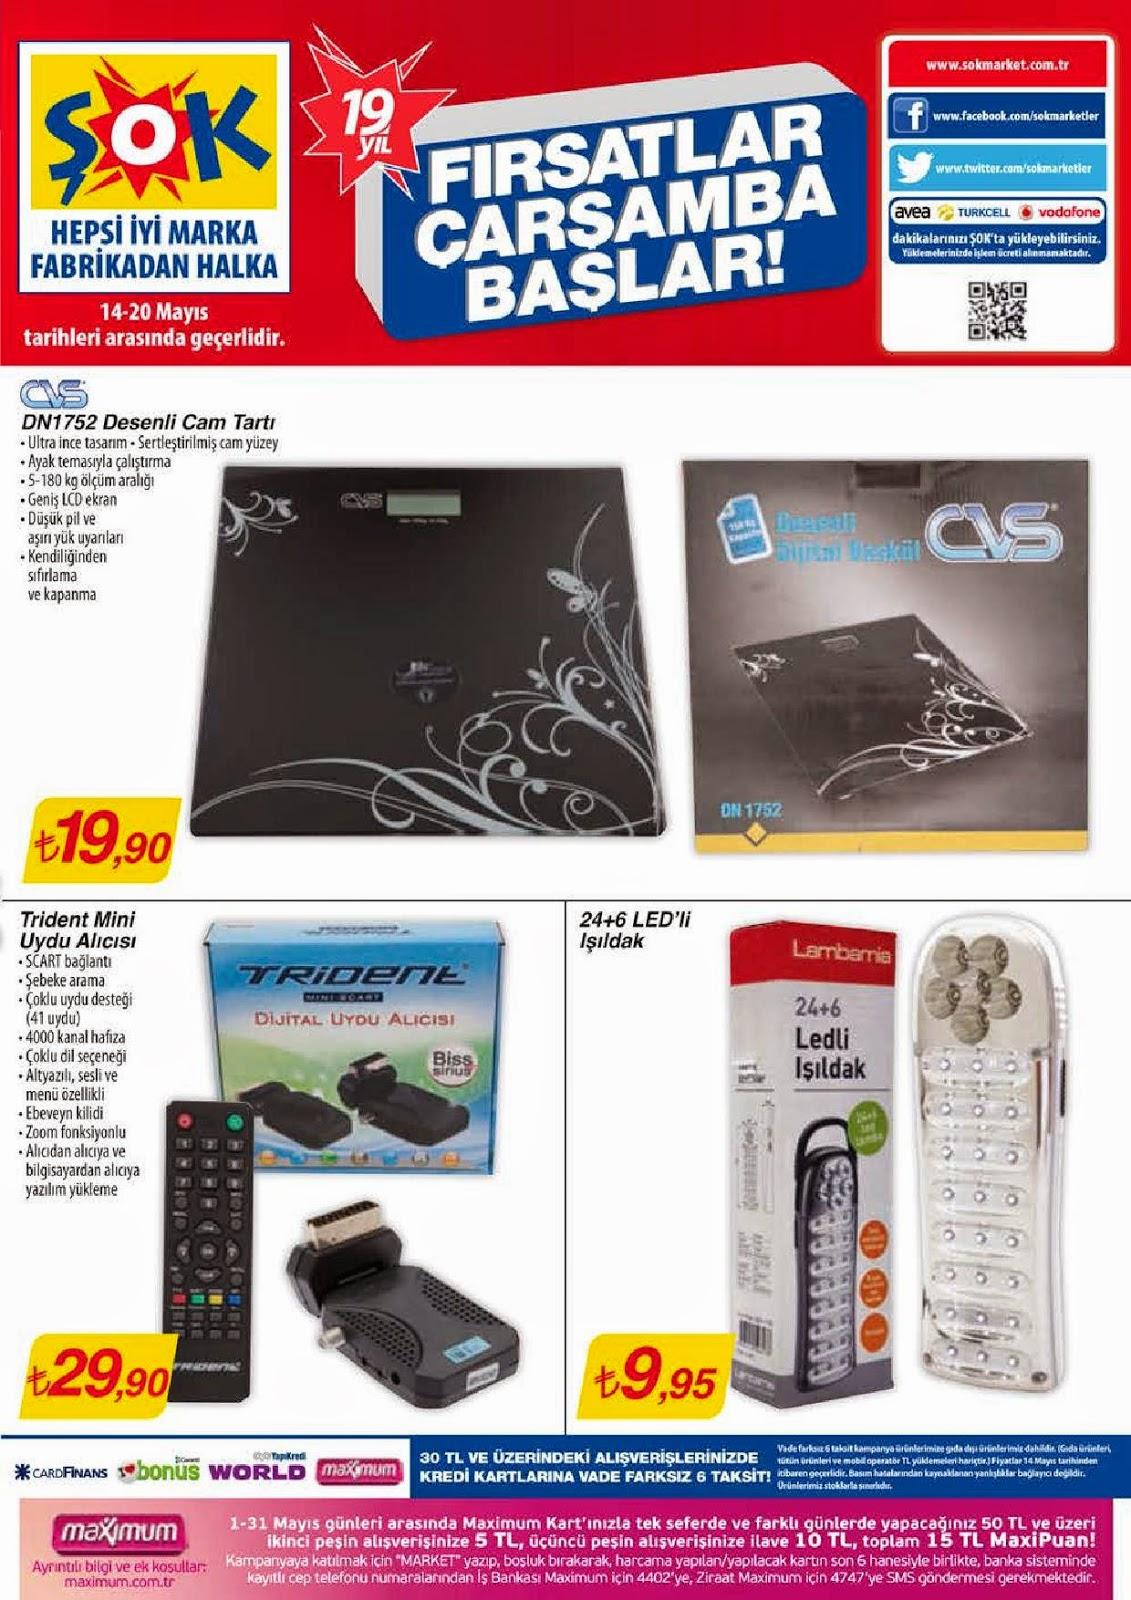 http://www.aktuelurunler.com/p/sponsor-baglantlar-adsbygoogle-window_7218.html